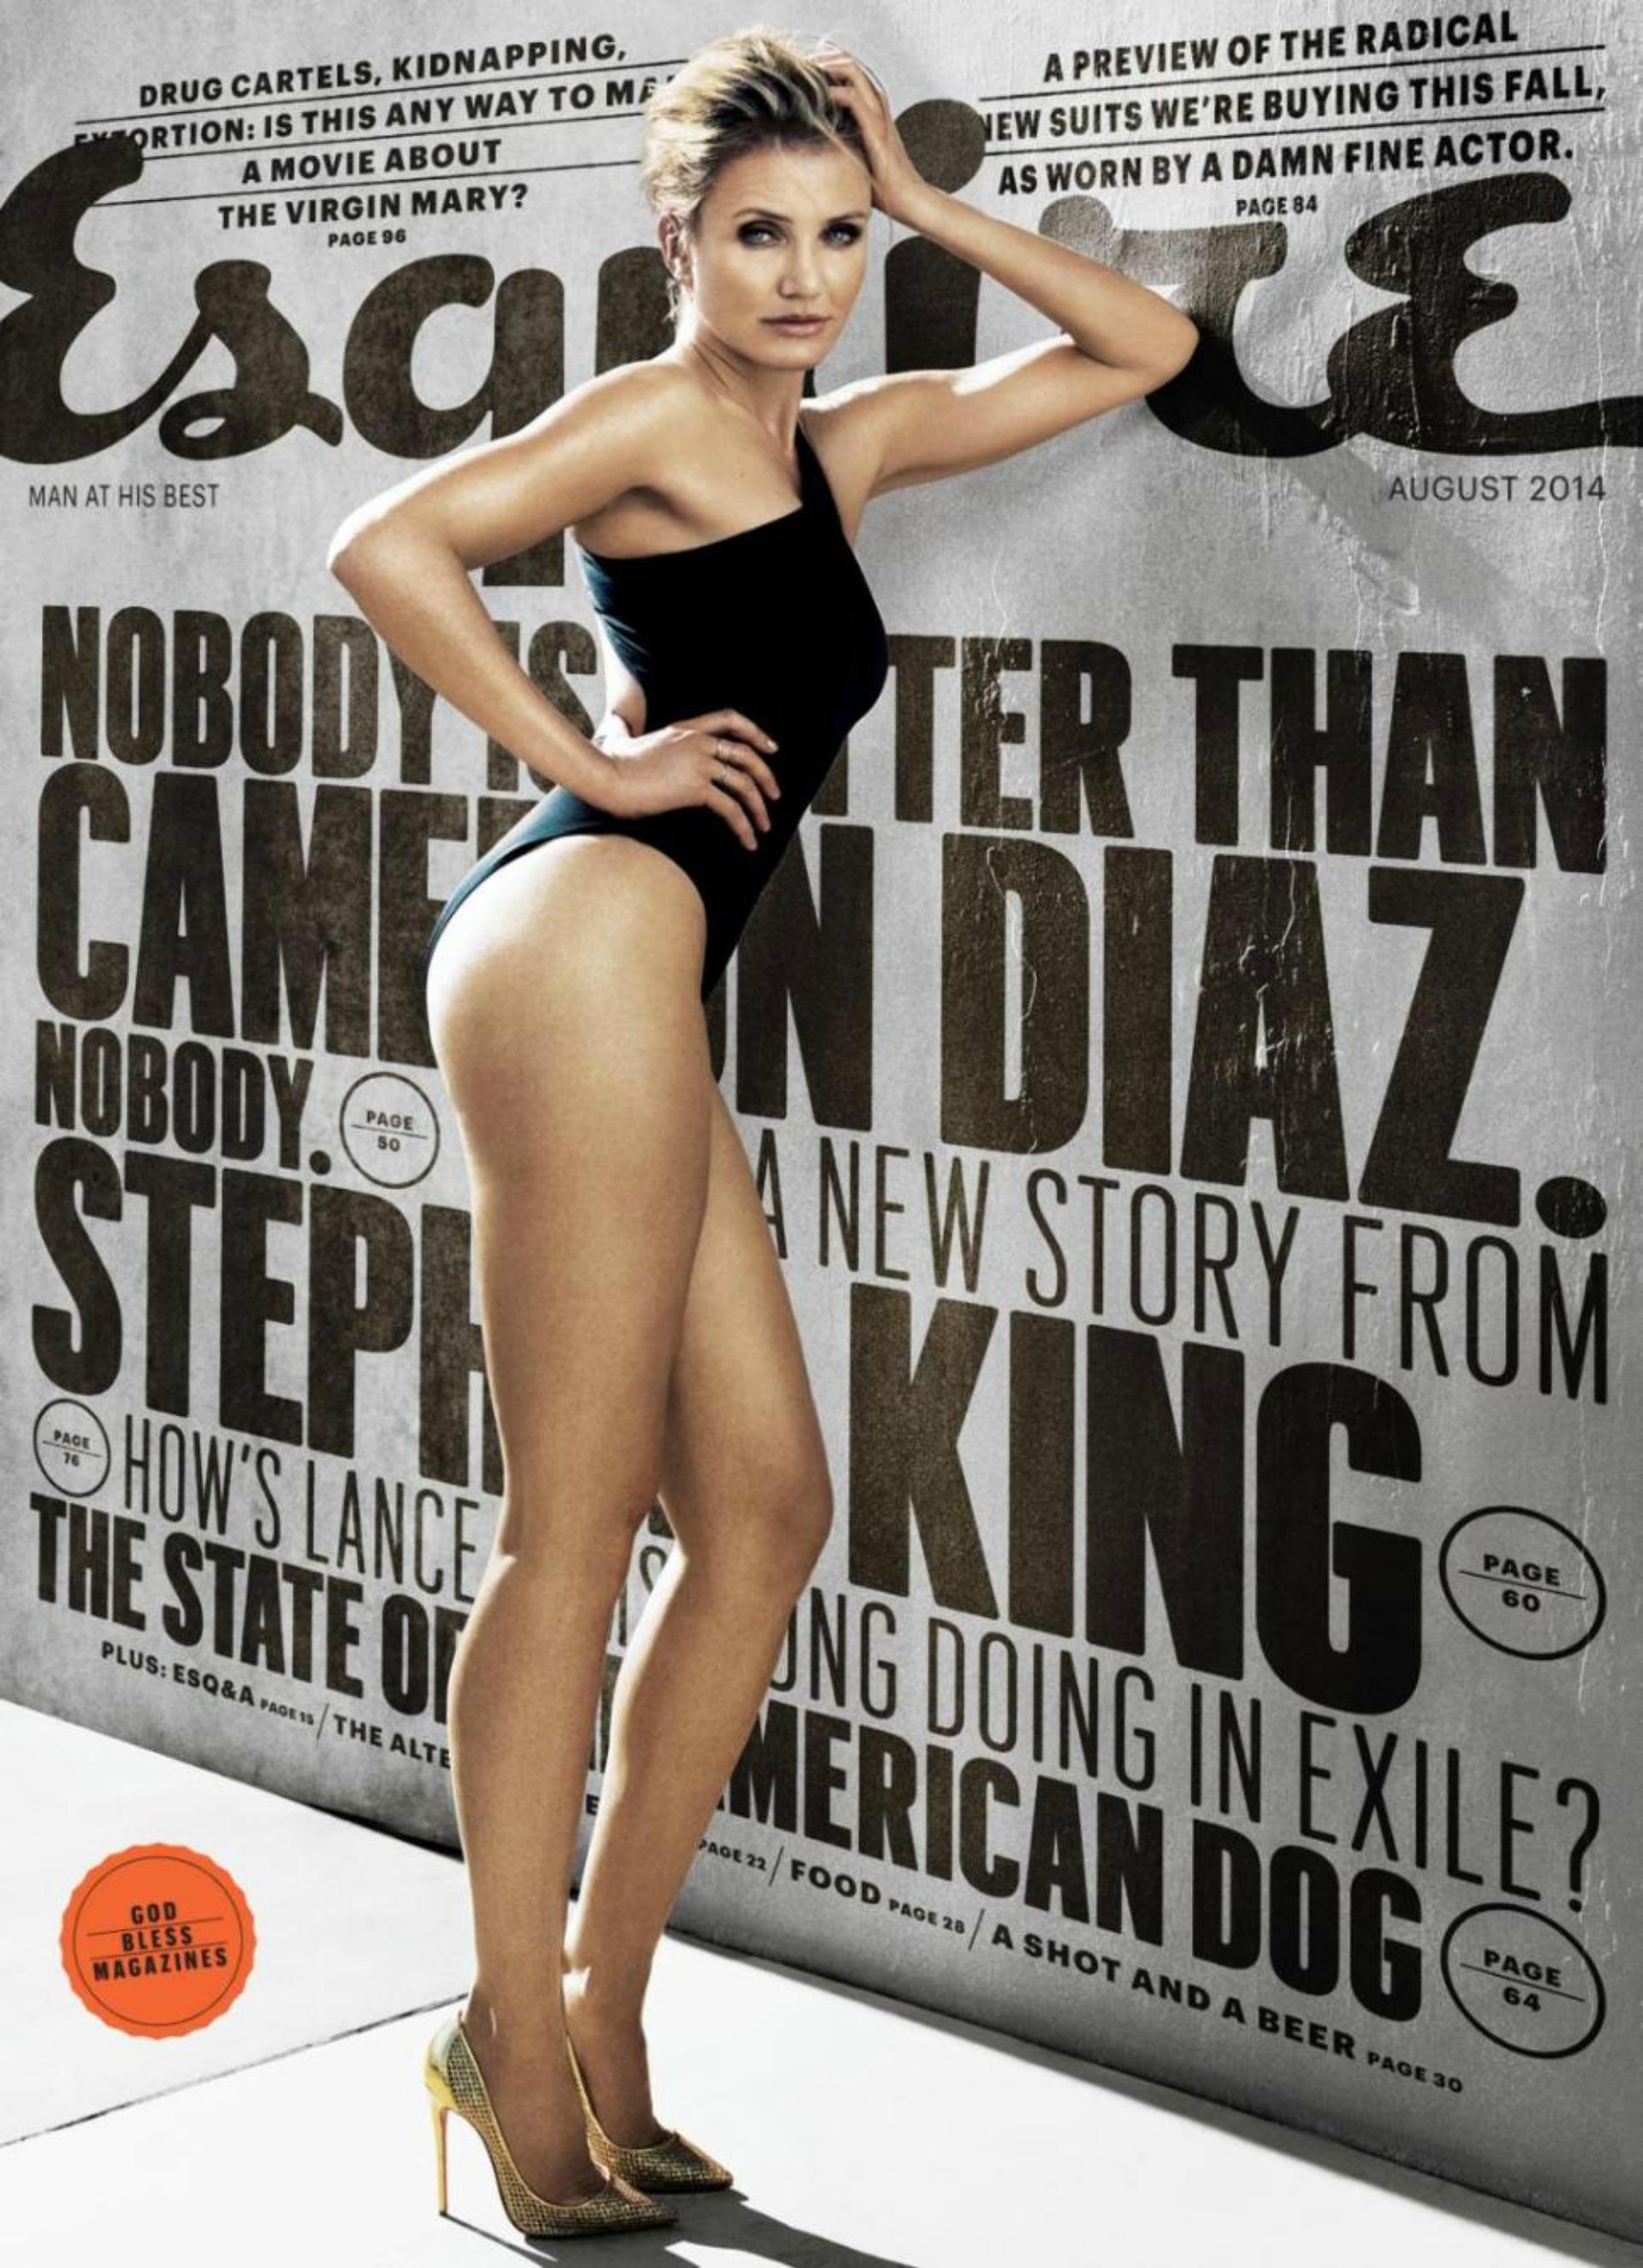 Diaz looks amazing on August Esquire cover